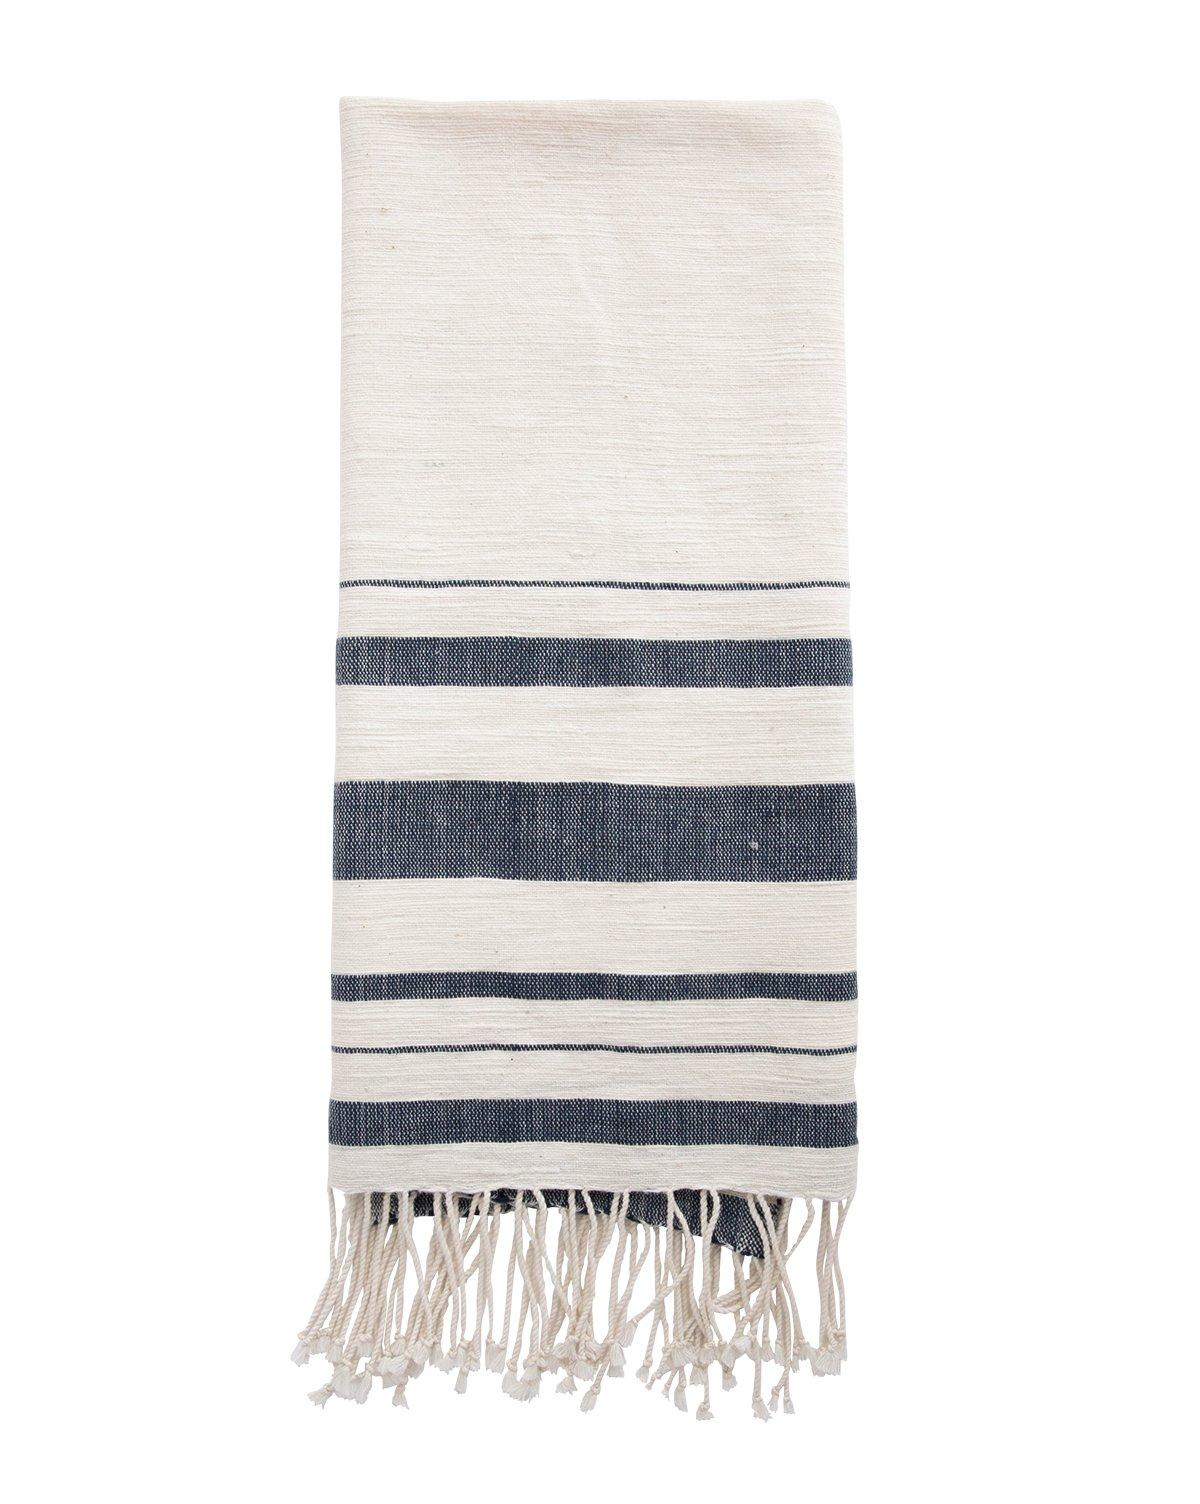 Upton_Stripe_Hand_Towel_1.jpg